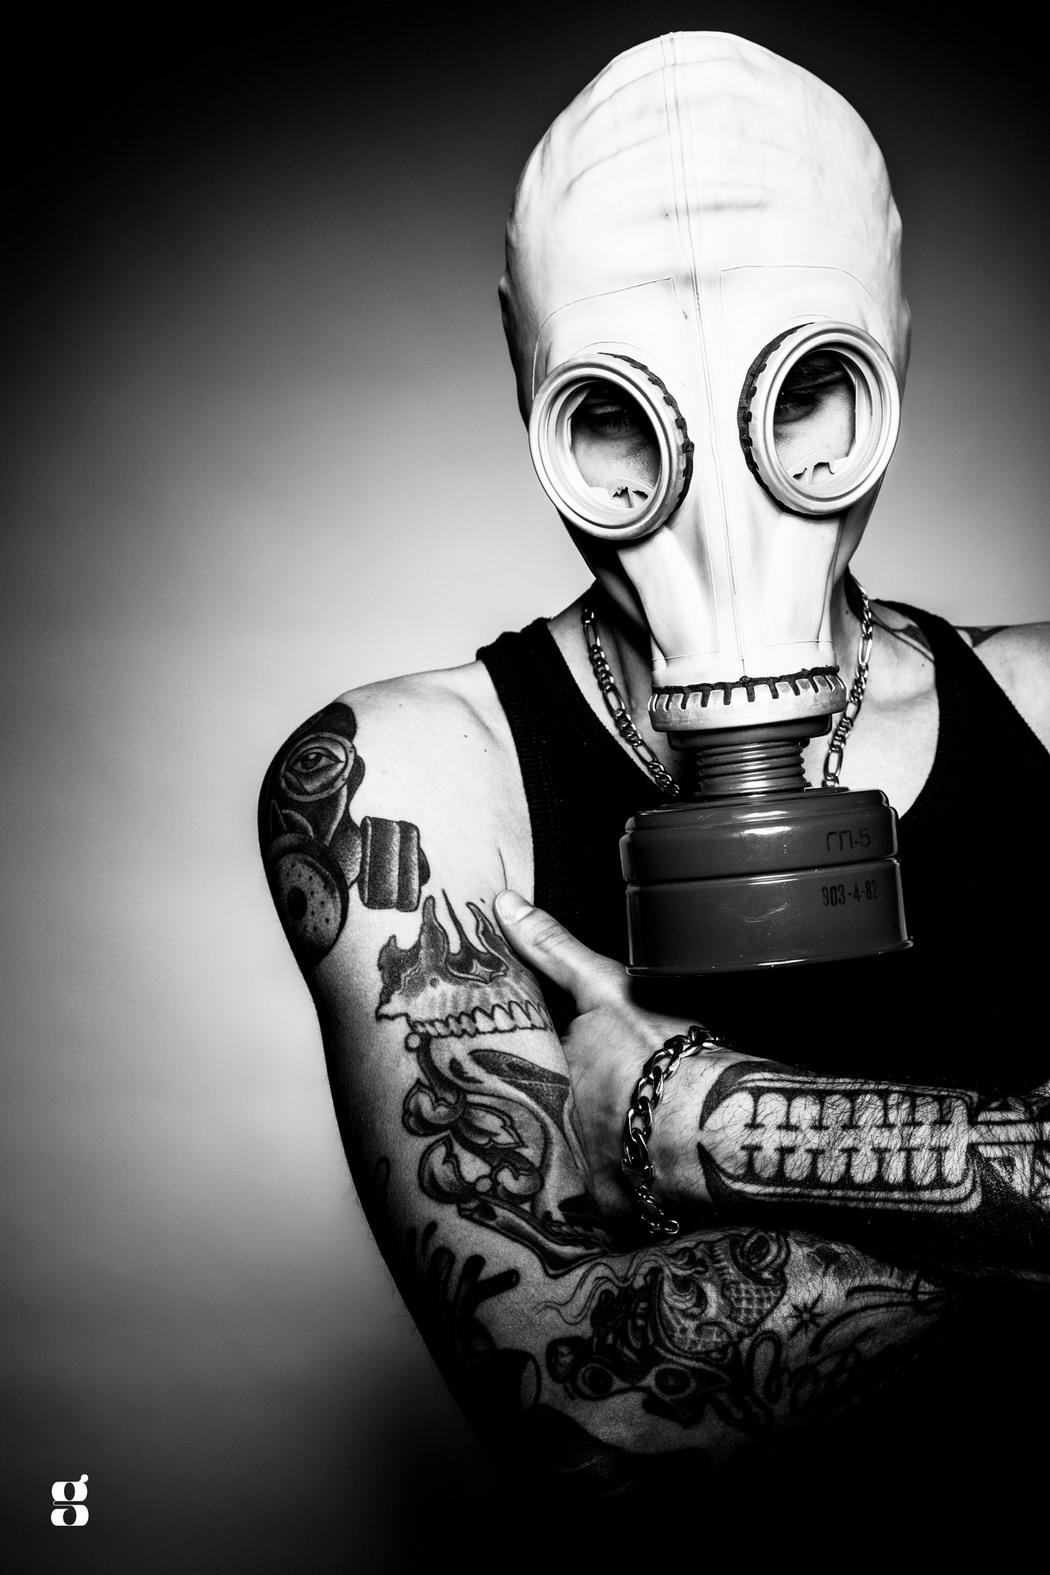 Gas Mask clipart mas Mask Pinterest Gas tras no